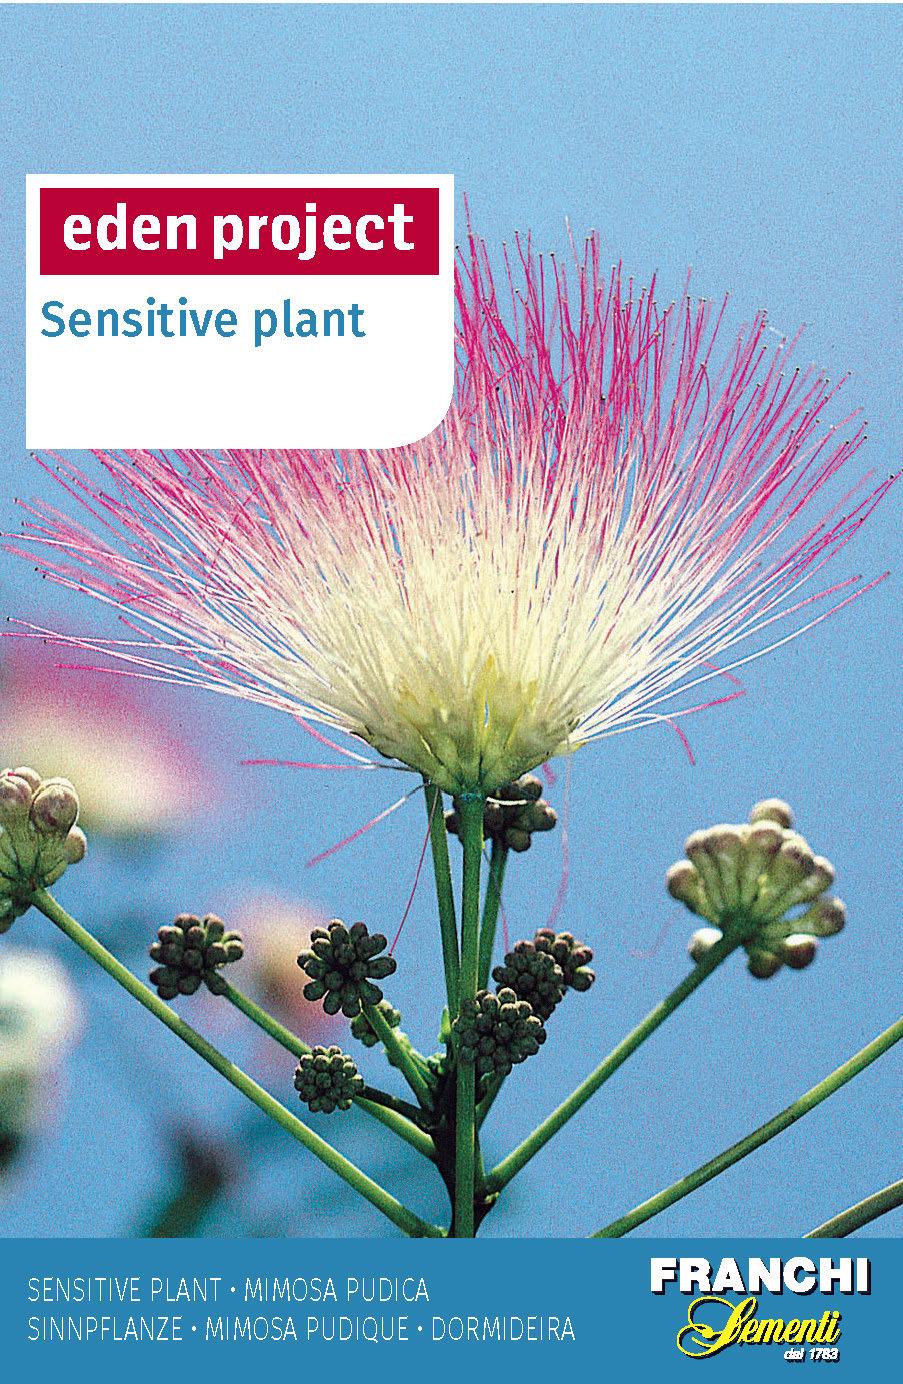 The Sensitive Plant - Mimosa pudica Eden Project Range